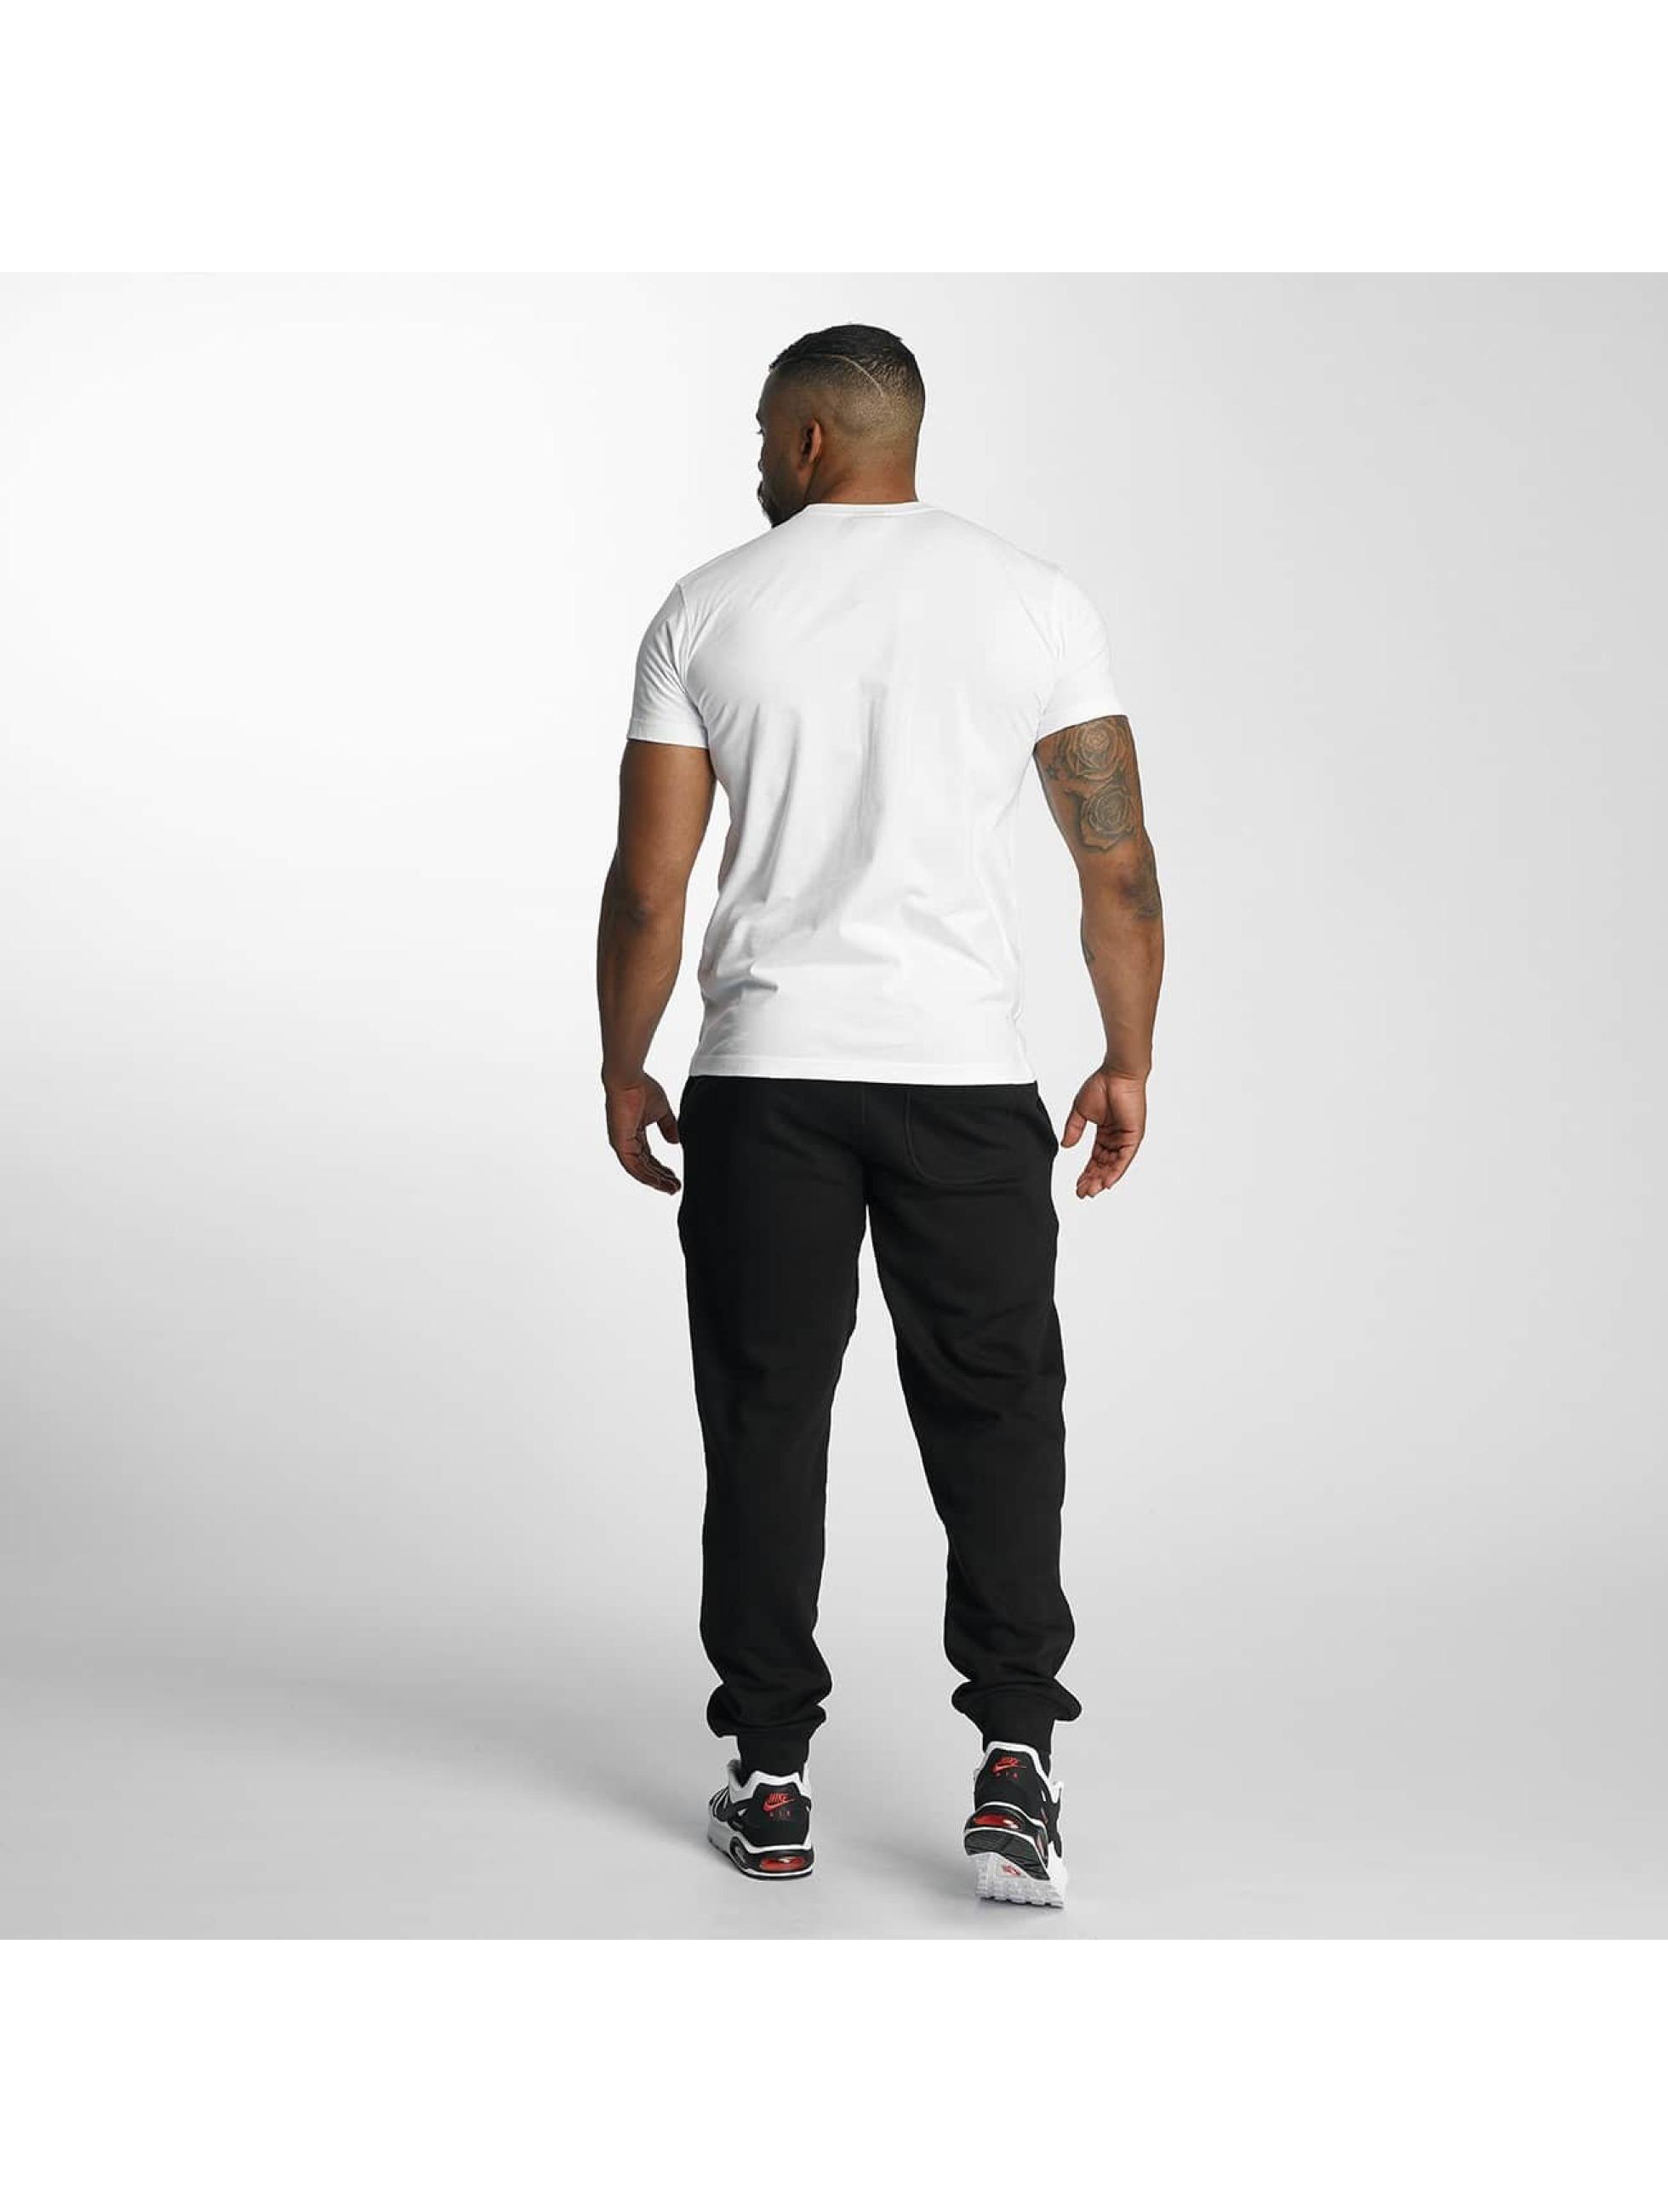 Pusher Apparel Camiseta White Carrera blanco